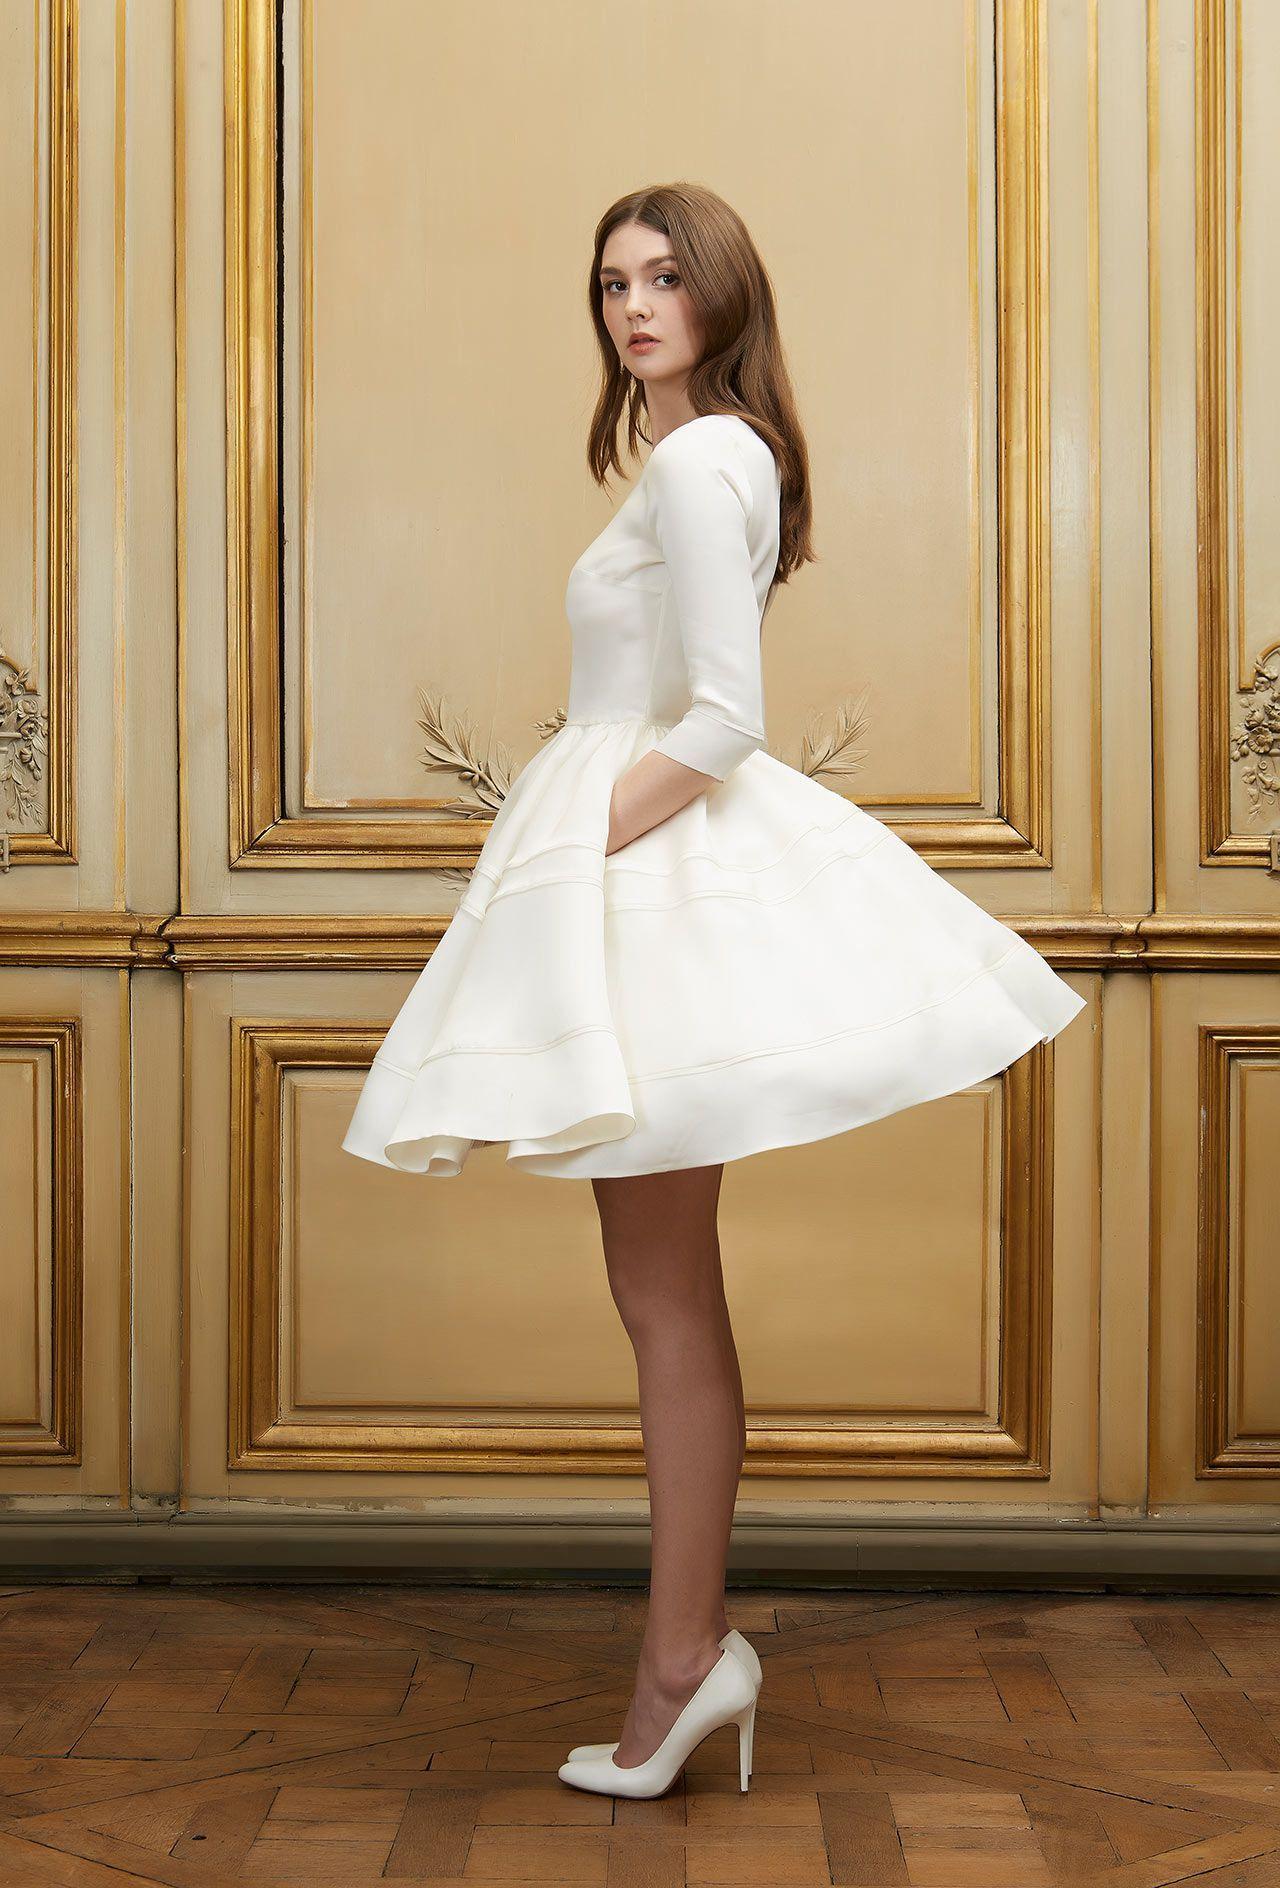 Prix d'une robe delphine manivet